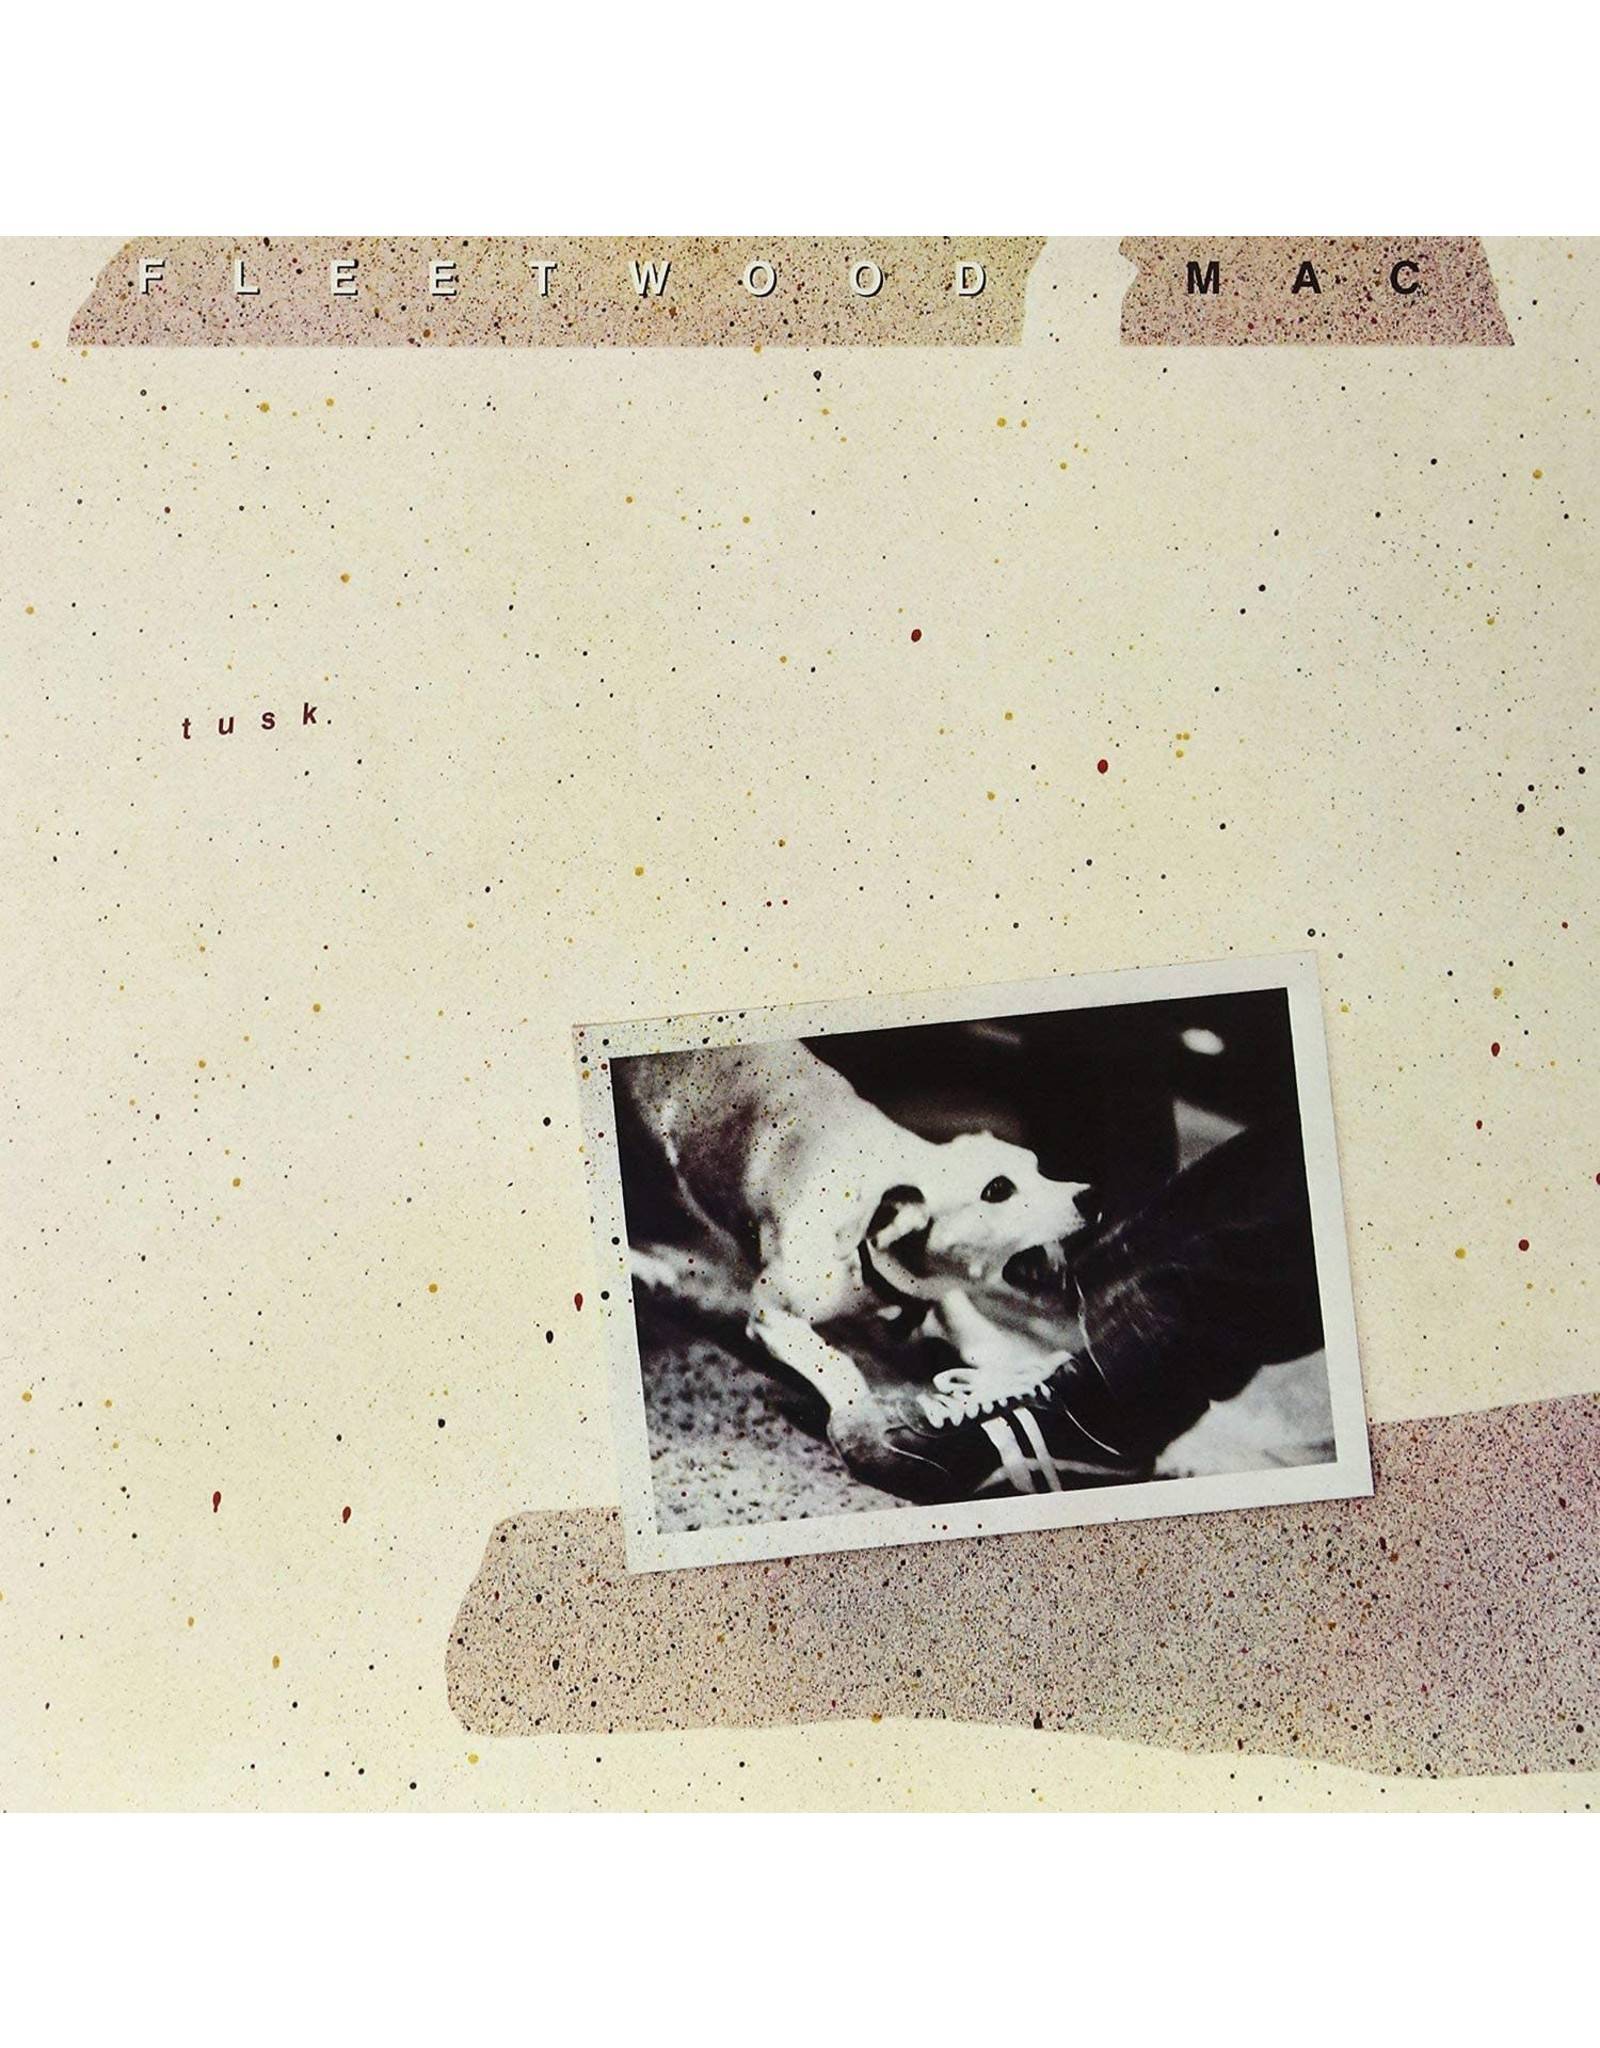 Fleetwood Mac - Tusk (Silver Vinyl)